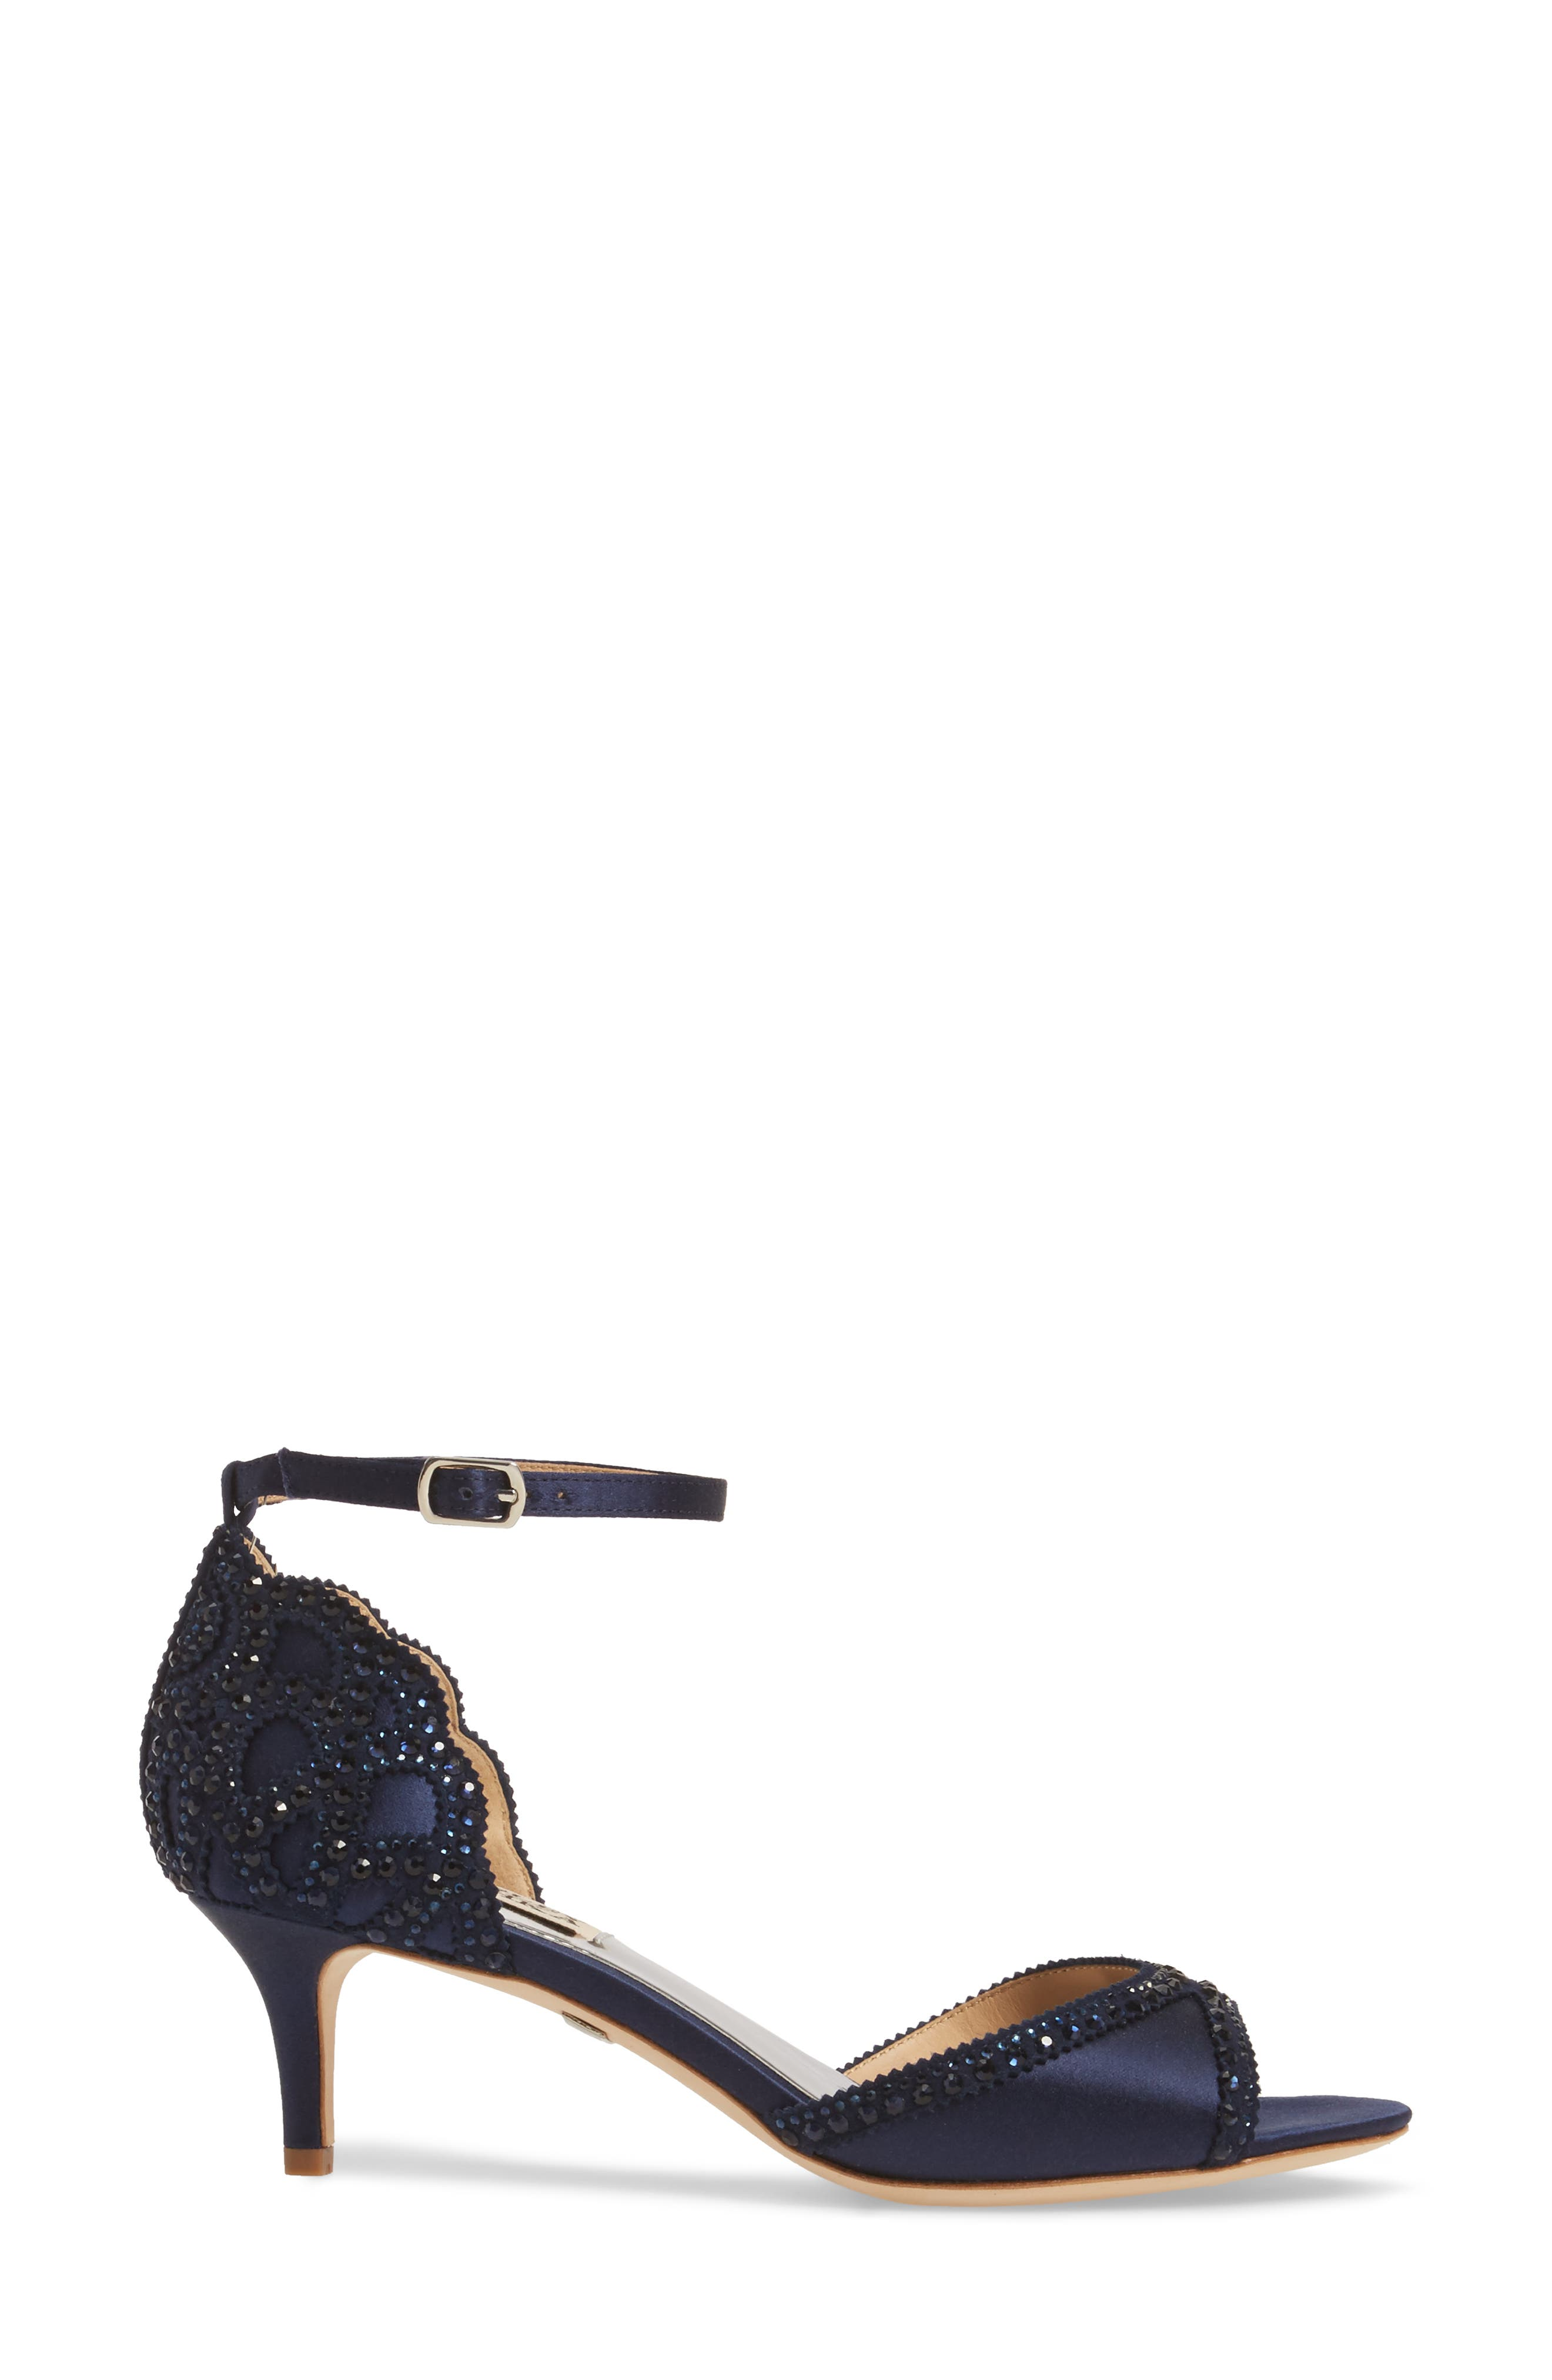 'Gillian' Crystal Embellished d'Orsay Sandal,                             Alternate thumbnail 3, color,                             Midnight Blue Satin